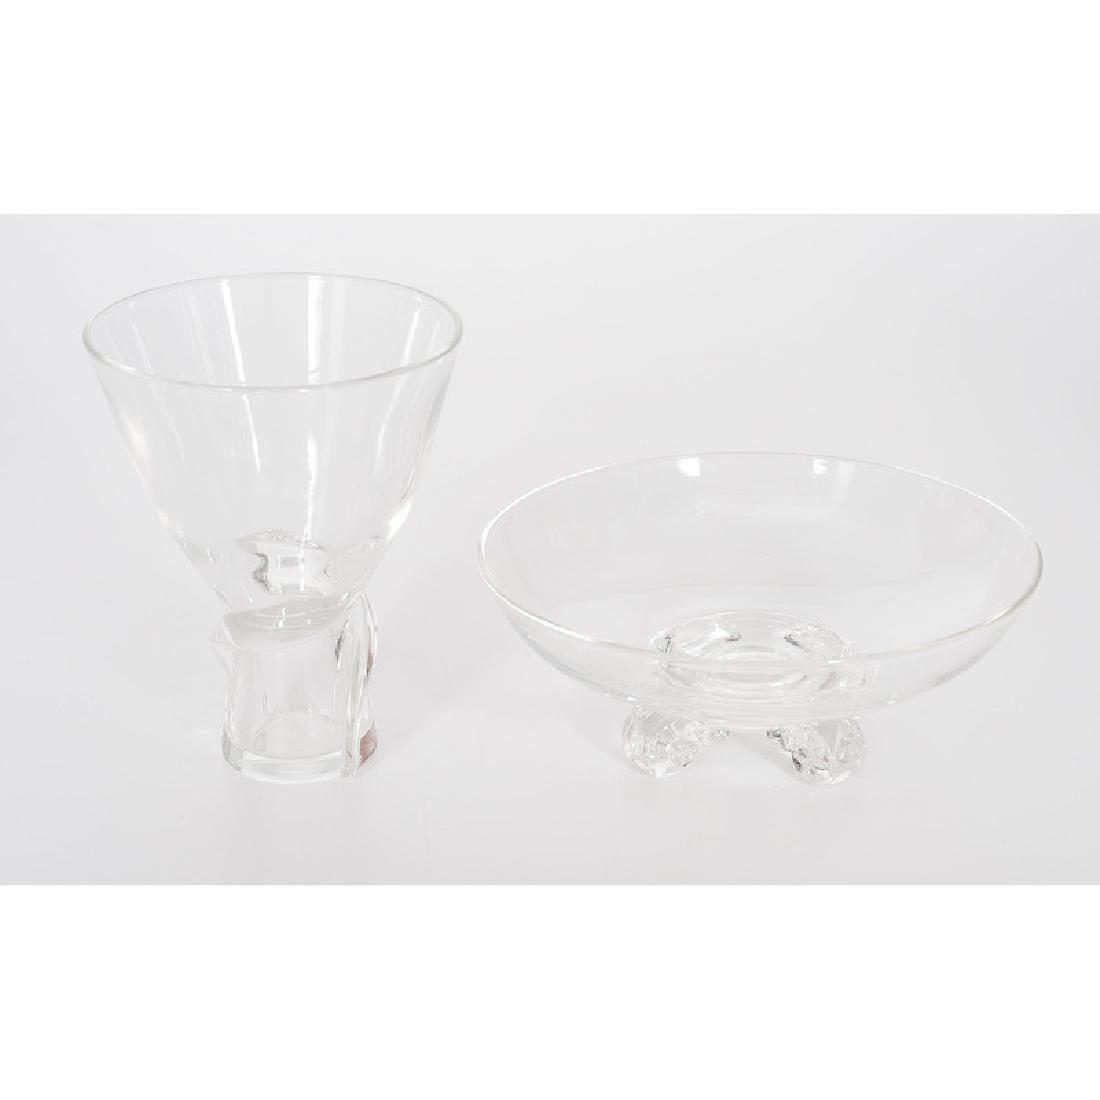 Steuben Crystal Vase and Bowl - 3